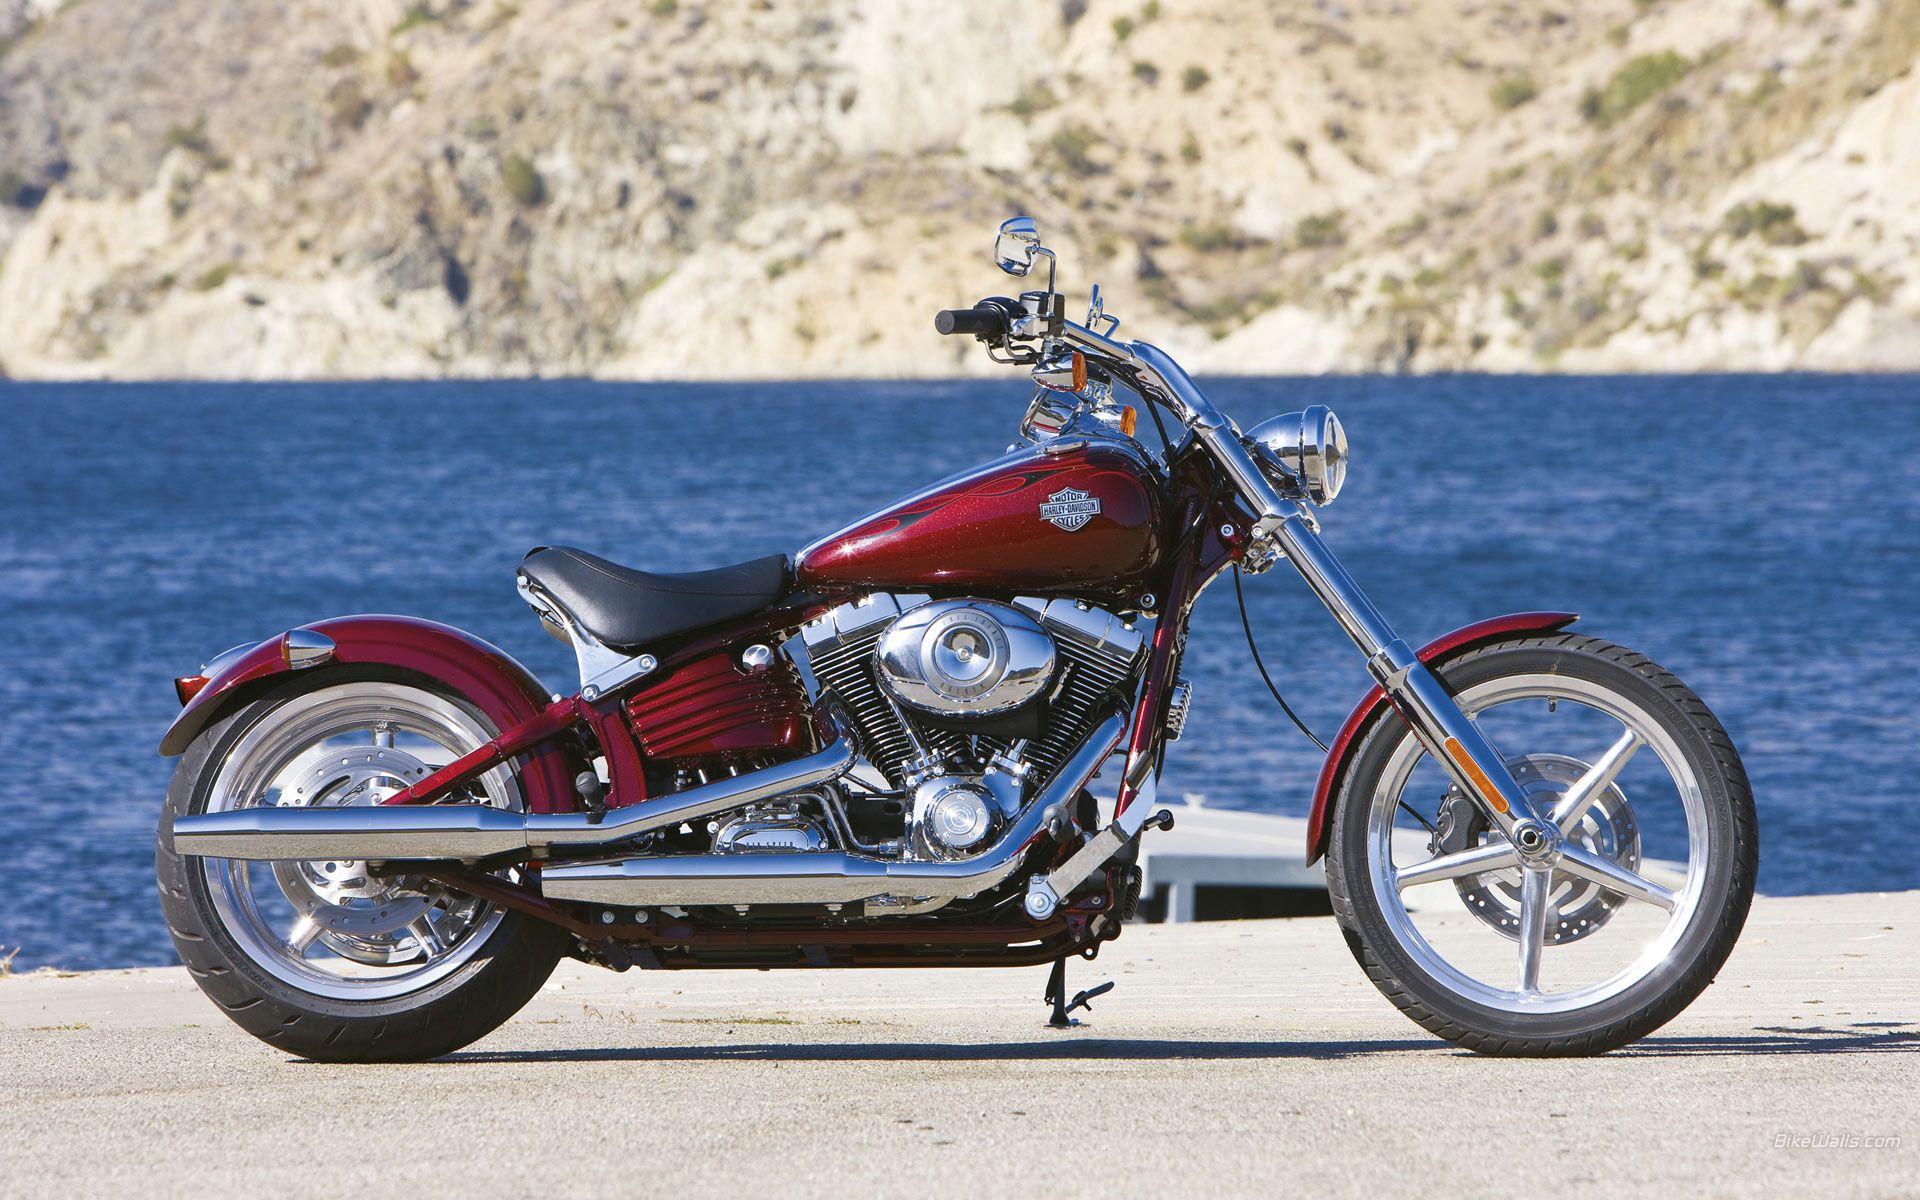 132589 скачать обои Мотоциклы, Harley-Davidson Rocker, Мотоцикл, House Of Thunder - заставки и картинки бесплатно